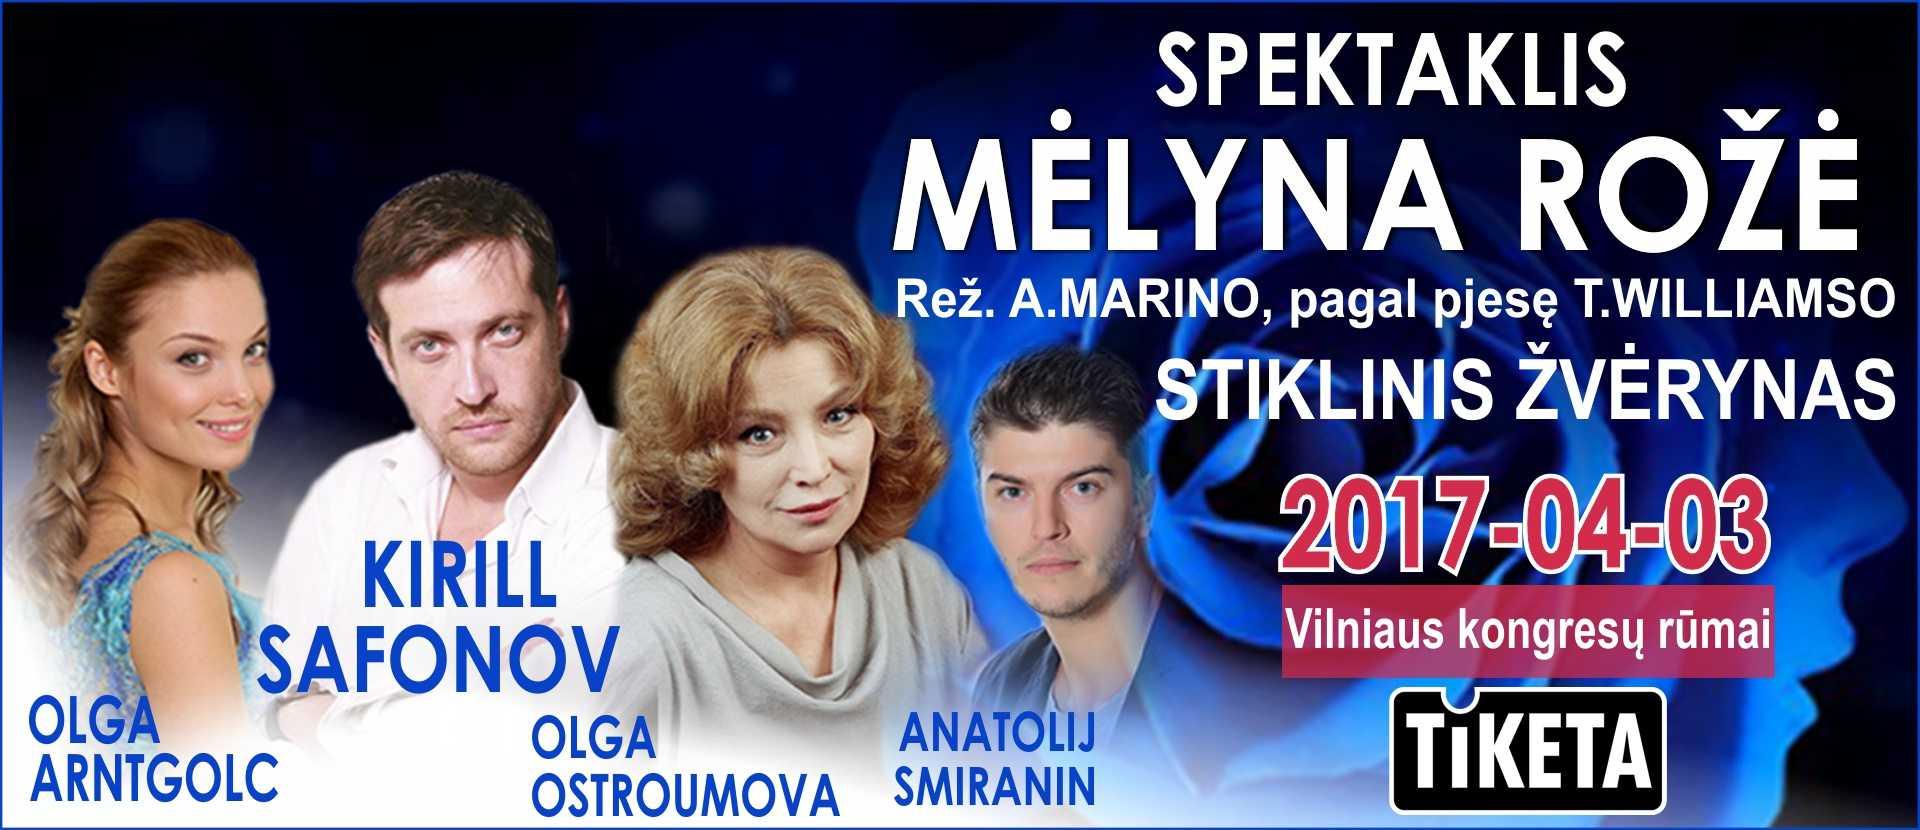 Spektaklis MĖLYNA ROŽĖ (STIKLINIS ŽVĖRYNAS)